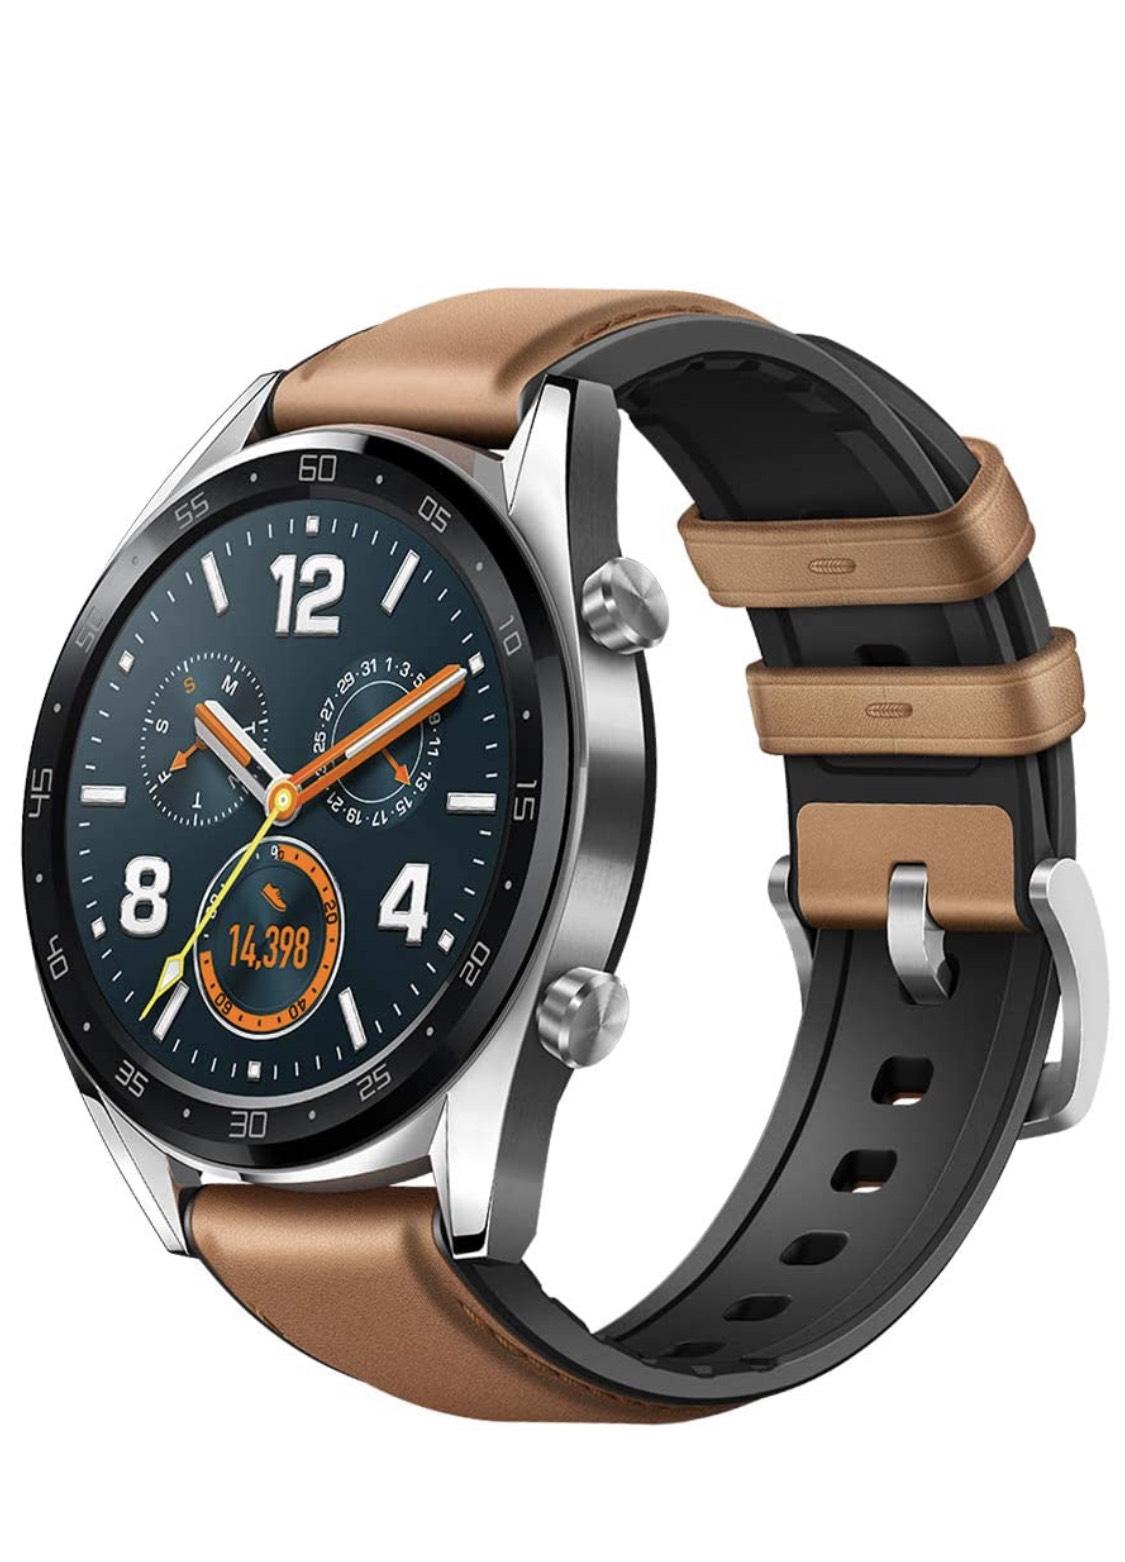 Montre connectée Huawei Watch GT - 46mm (Vendeur tiers)